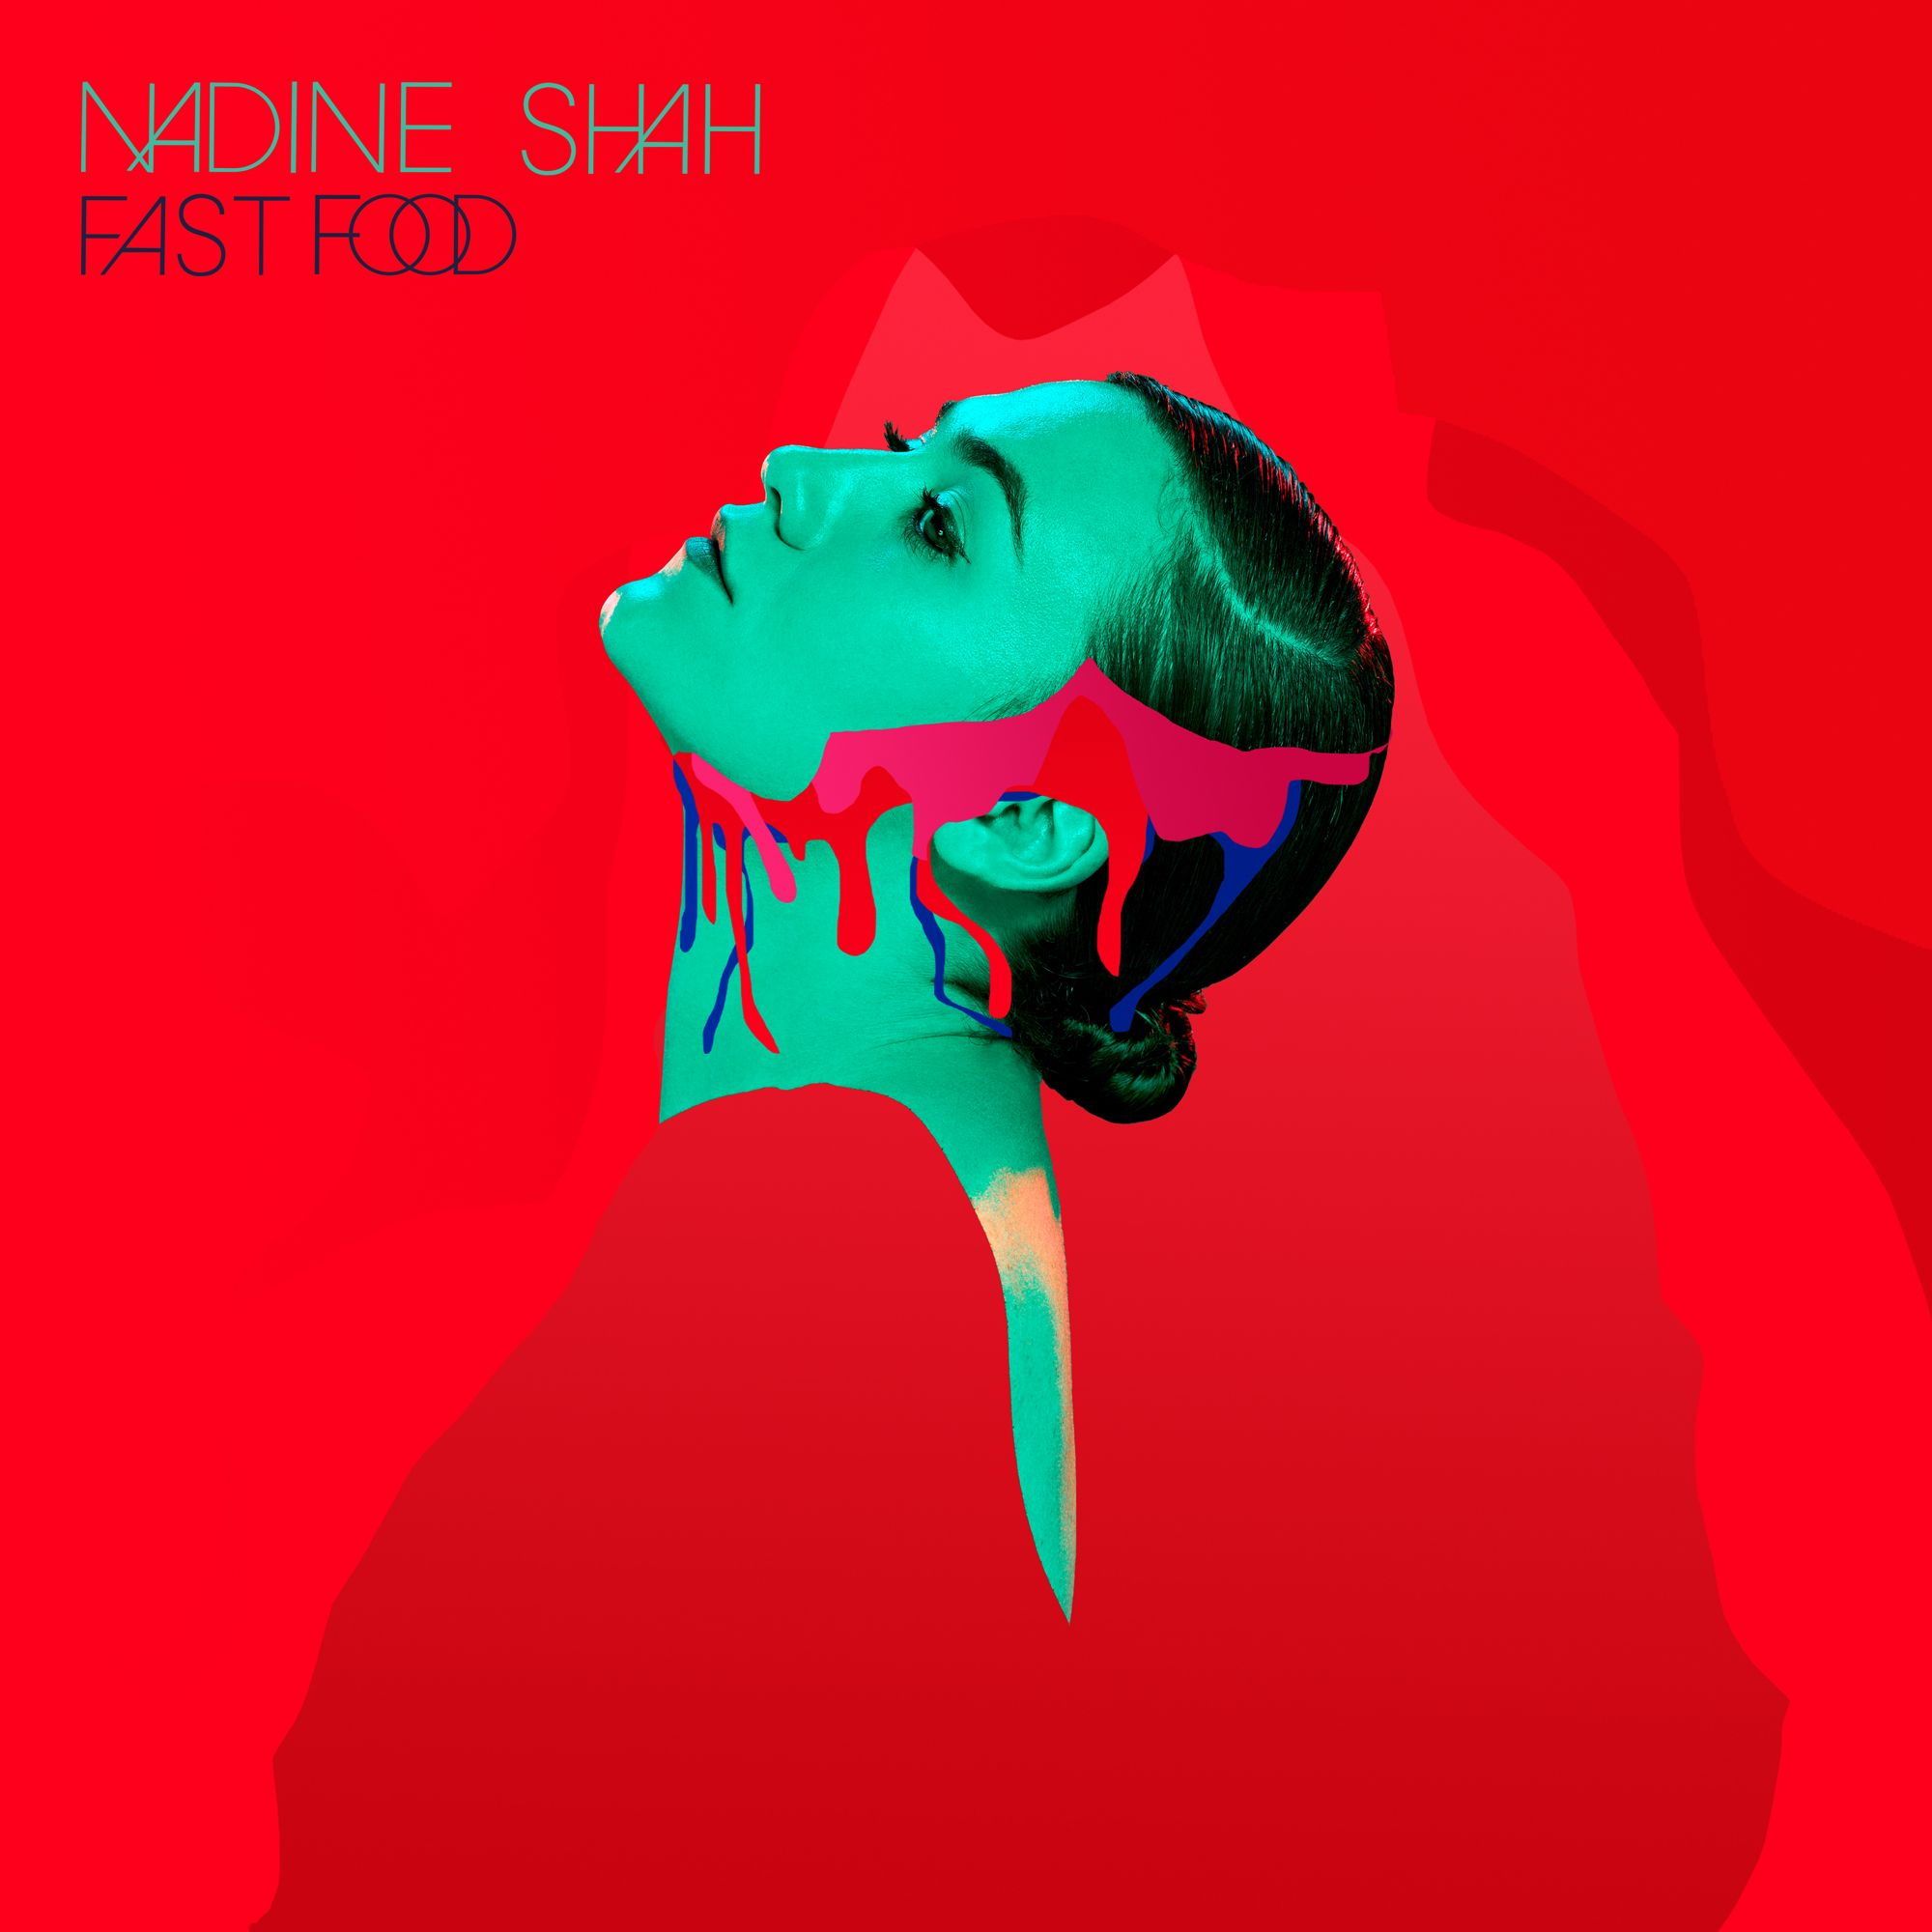 Nadine Shah - Fast Food album cover